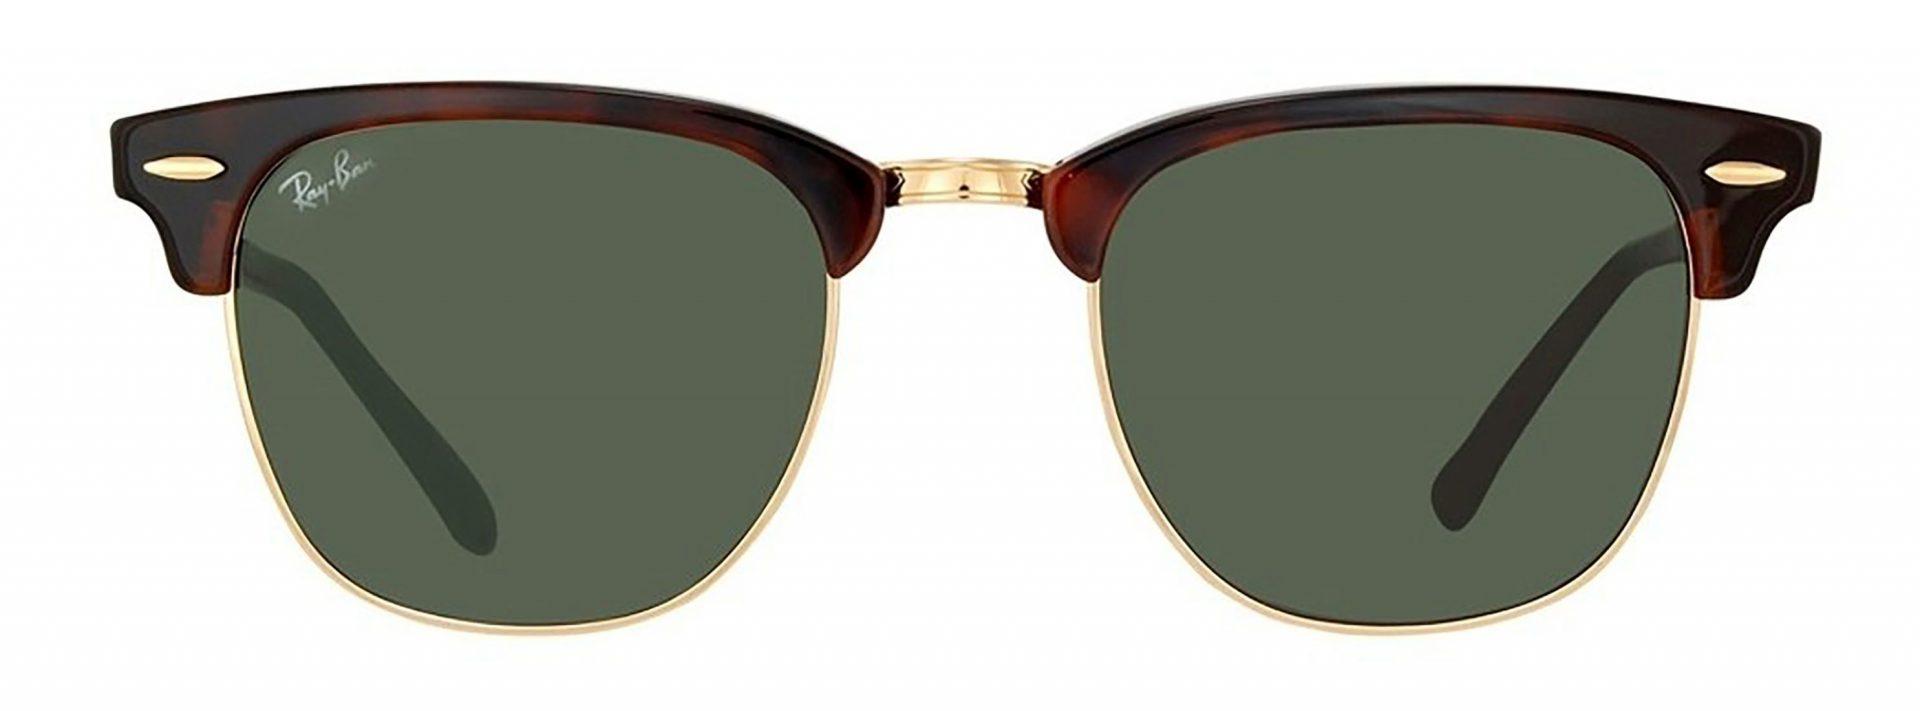 Ray-Ban Sunglasses Rb 3016 W0366 E 2970x1100